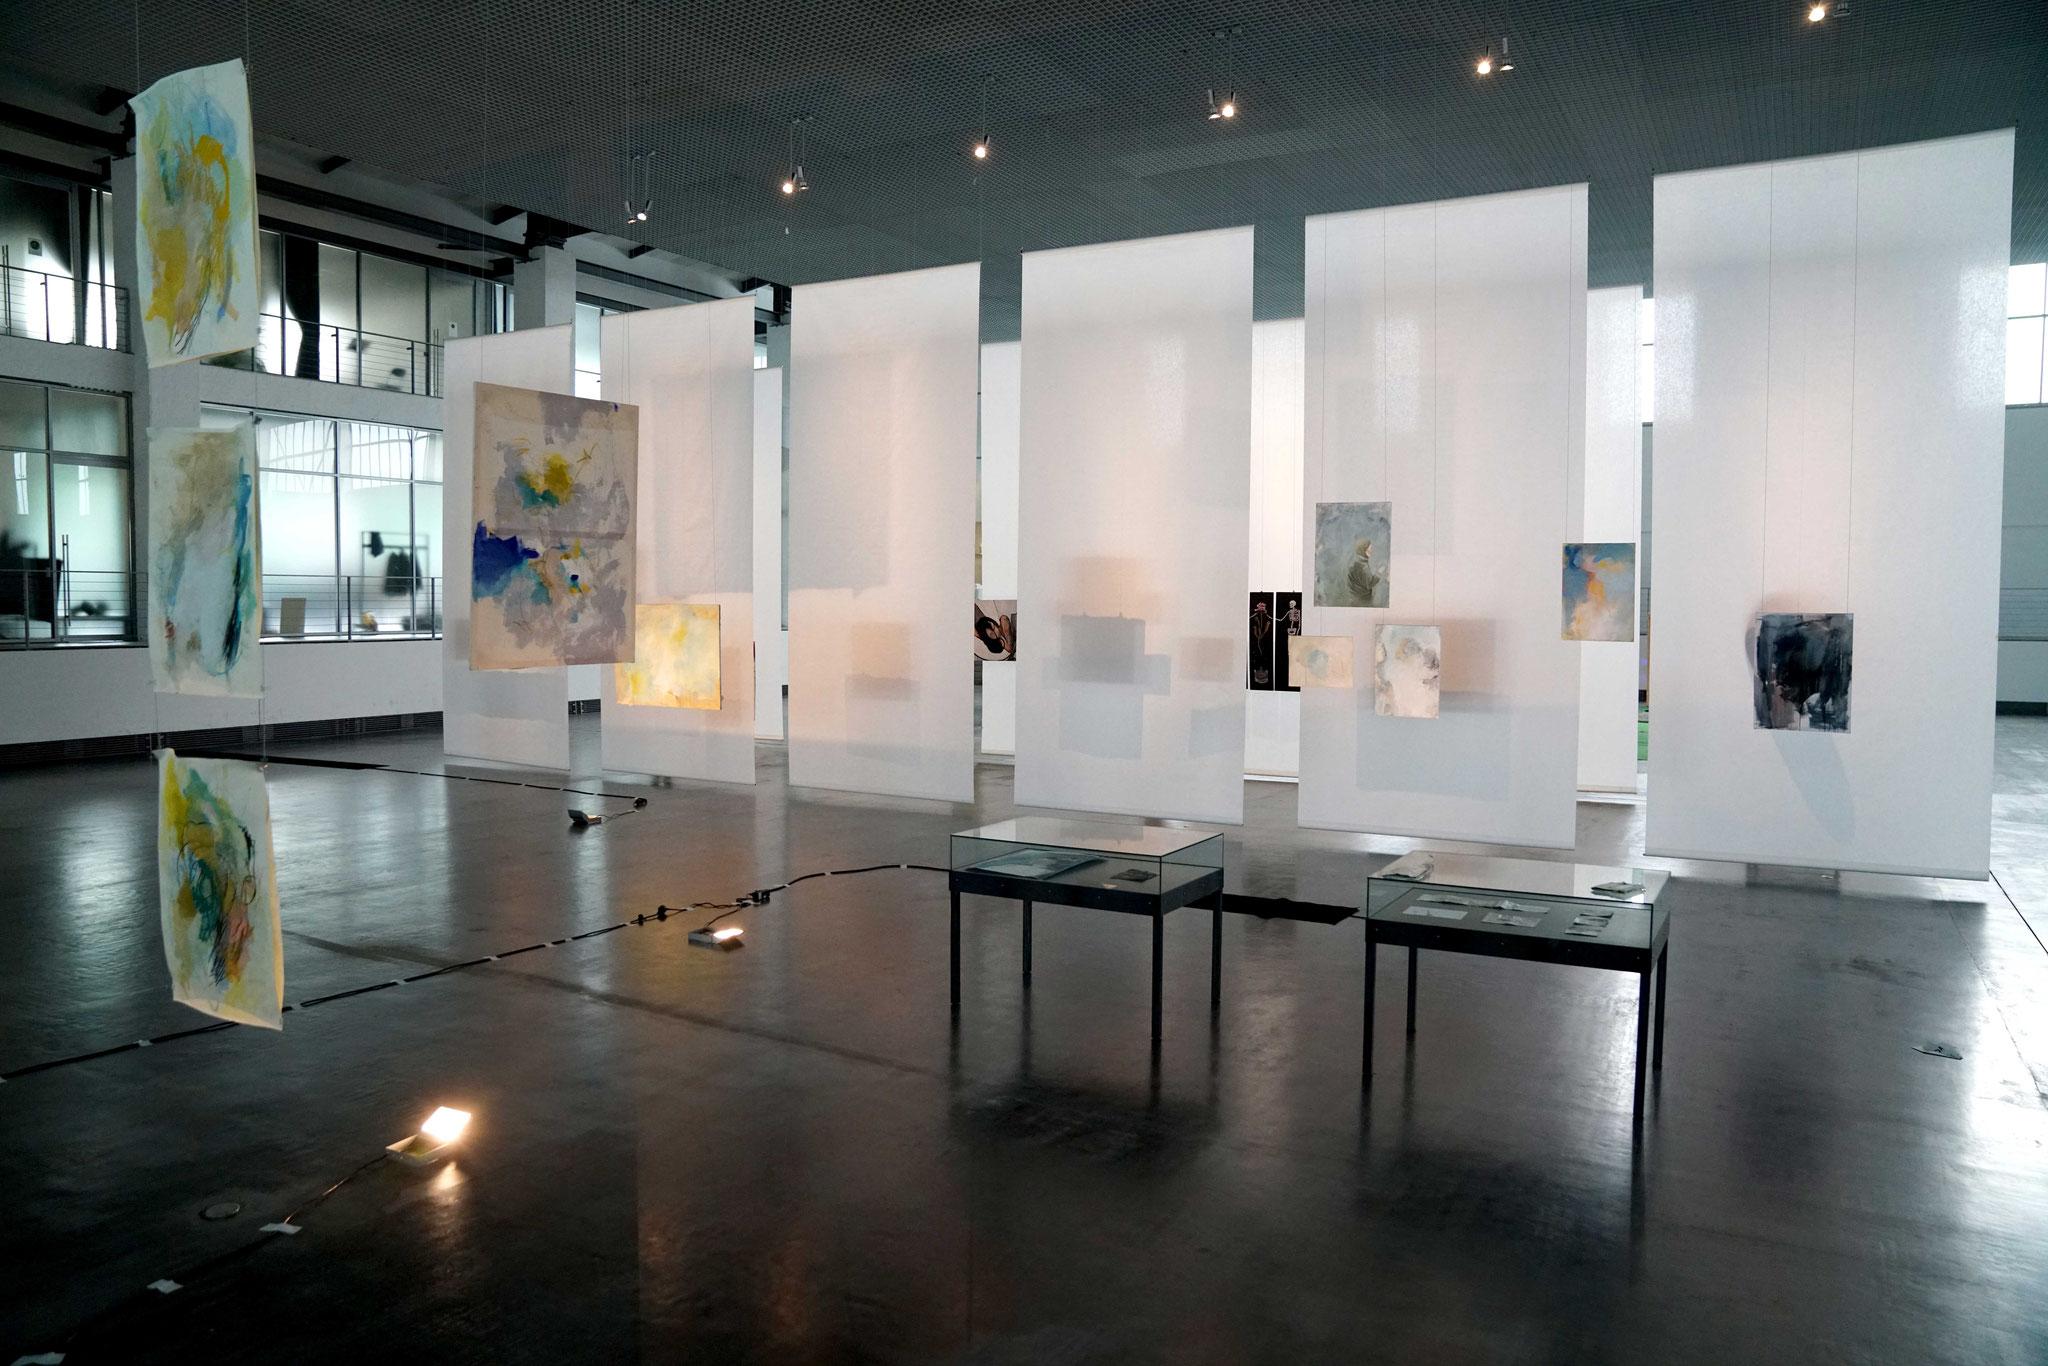 Clash Of Arts (2018) - Hangar 21 Detmold